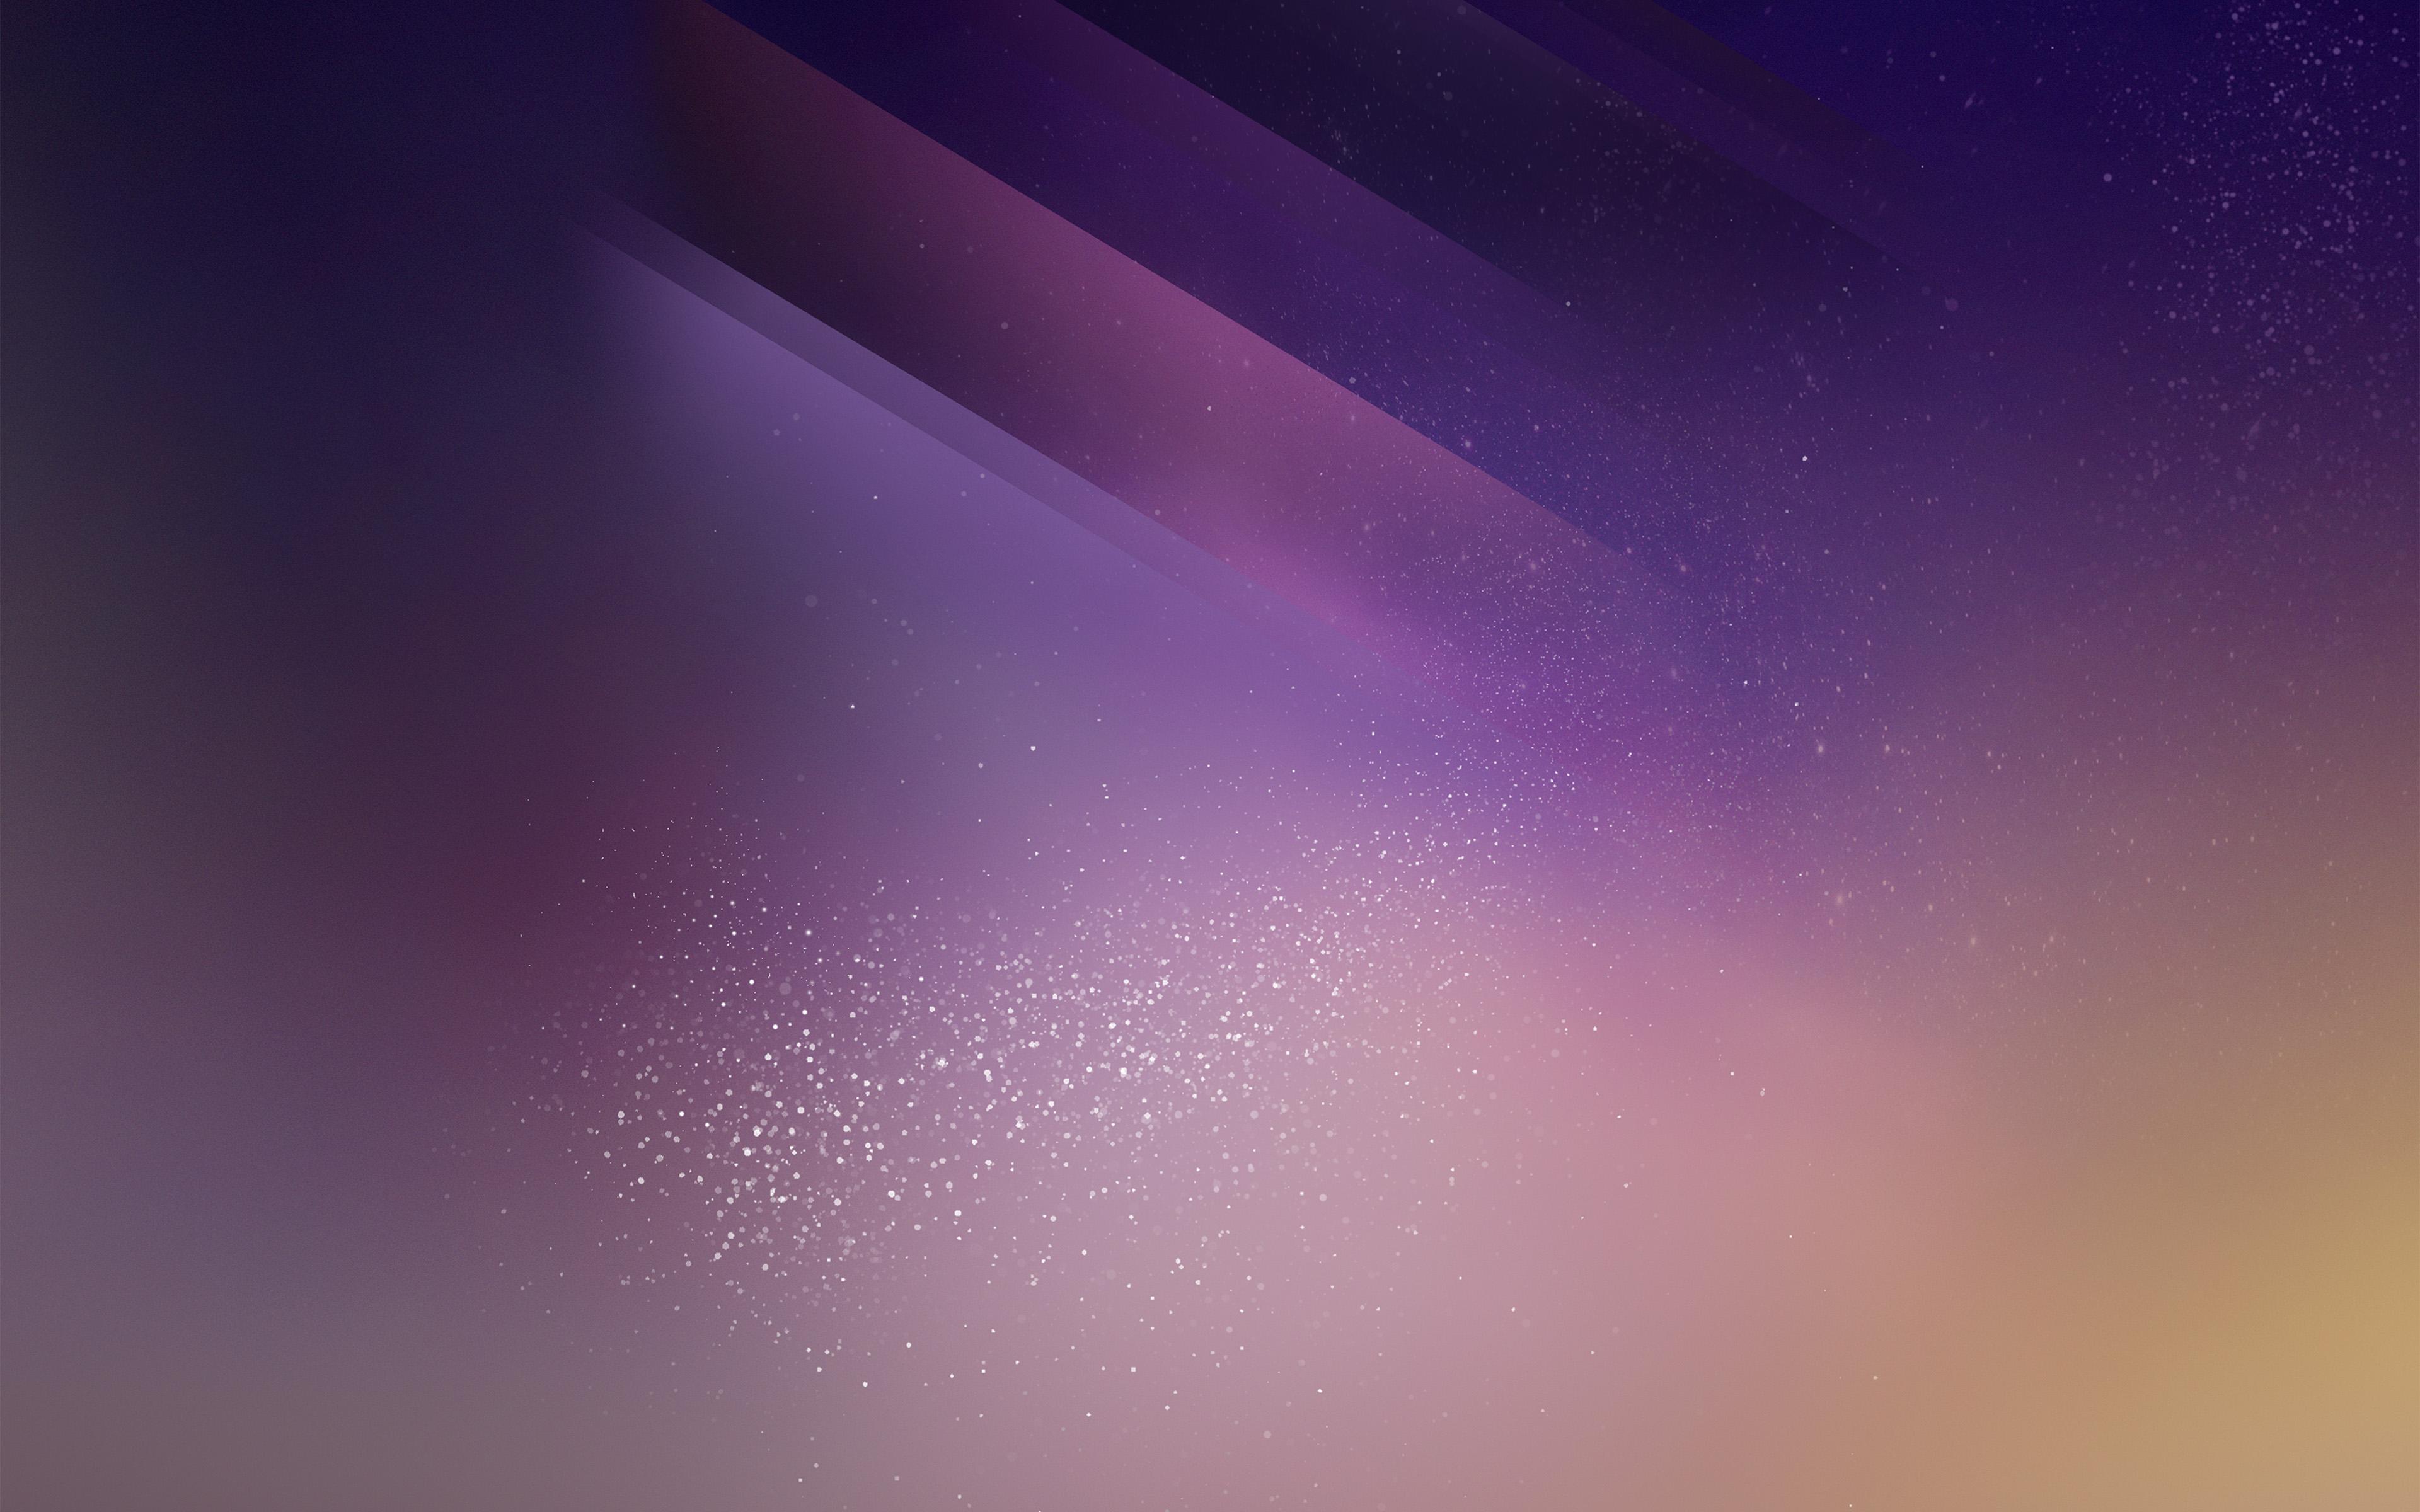 Samsung Background: Vw11-beautiful-galaxy-s8-samsung-soft-pattern-background